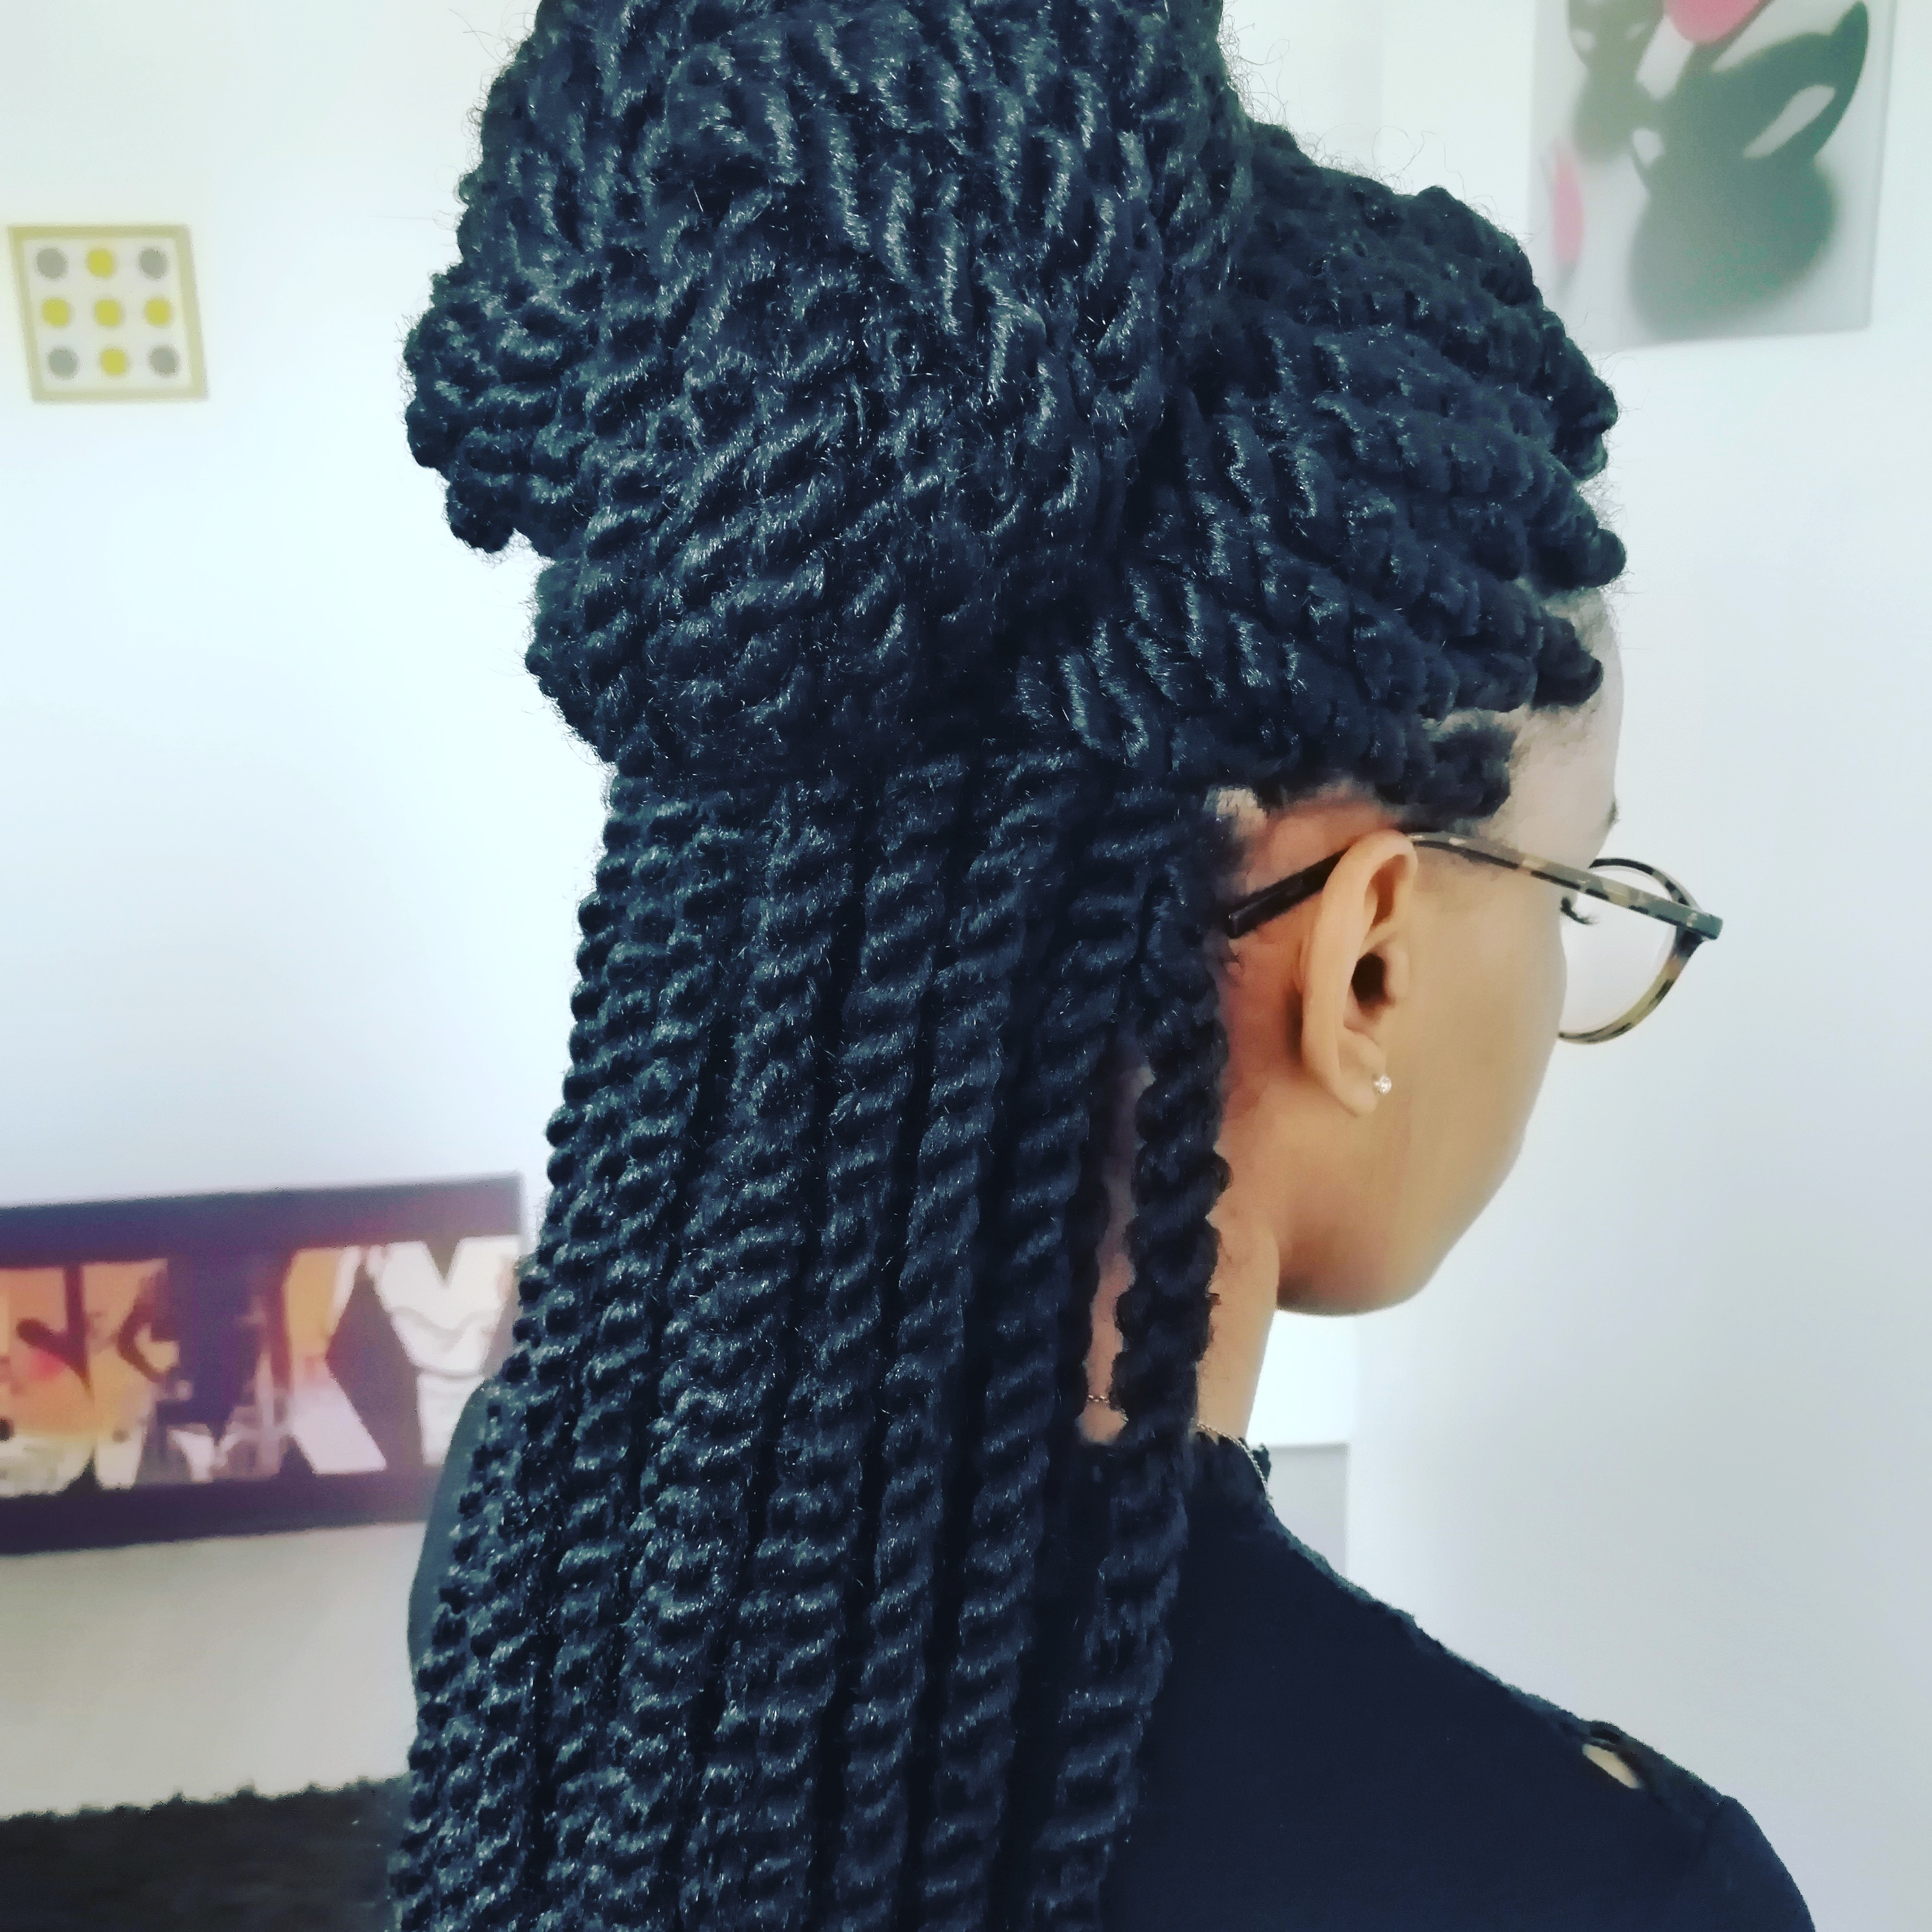 salon de coiffure afro tresse tresses box braids crochet braids vanilles tissages paris 75 77 78 91 92 93 94 95 UZMHDHNA